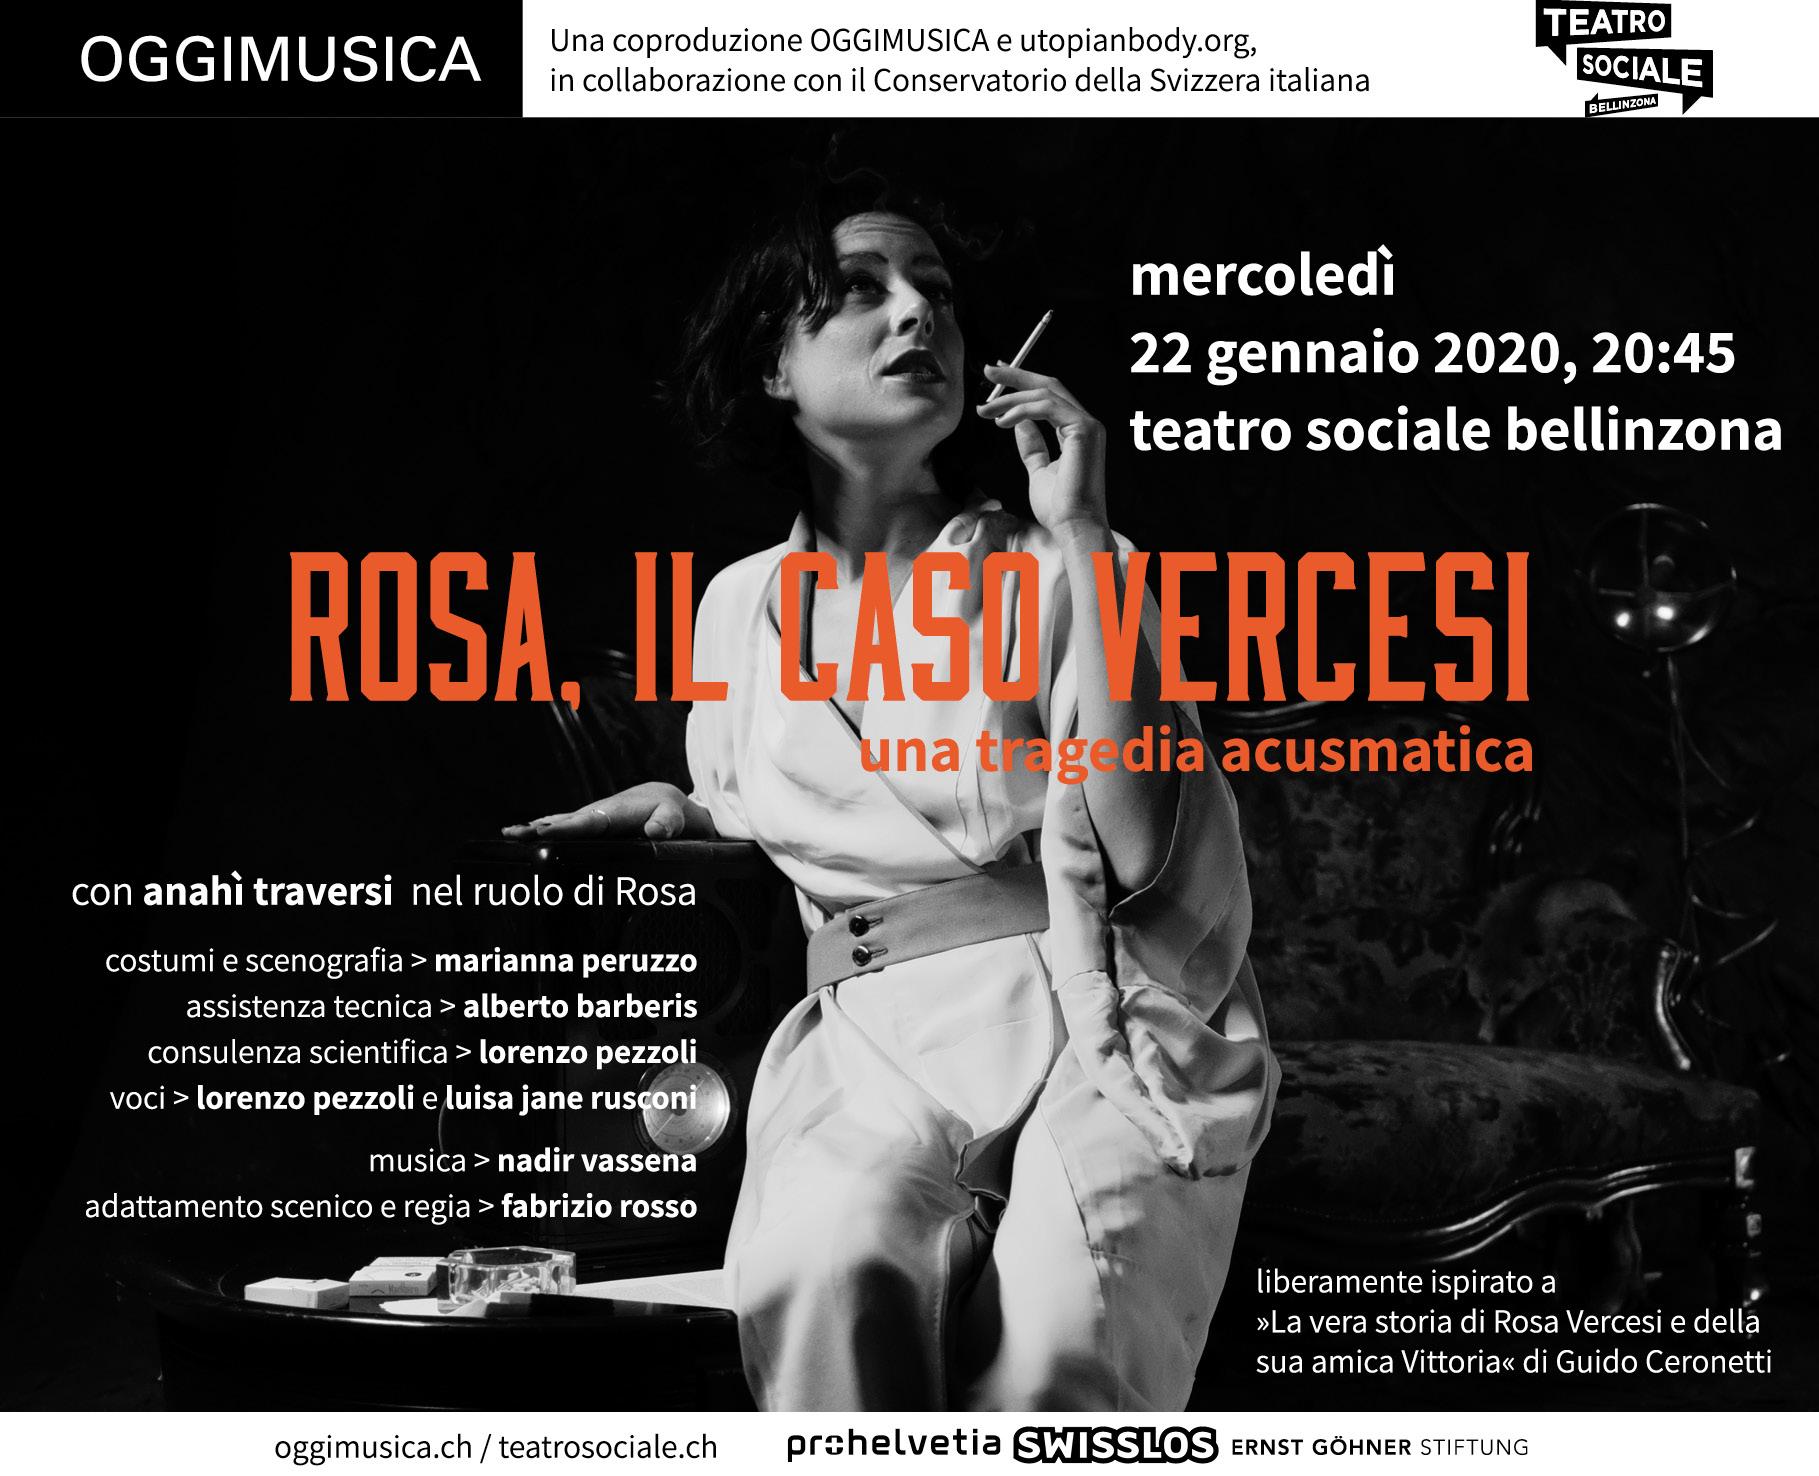 Rosa Vercesi, 22 gennaio 2020, tetro sociale belinninzona